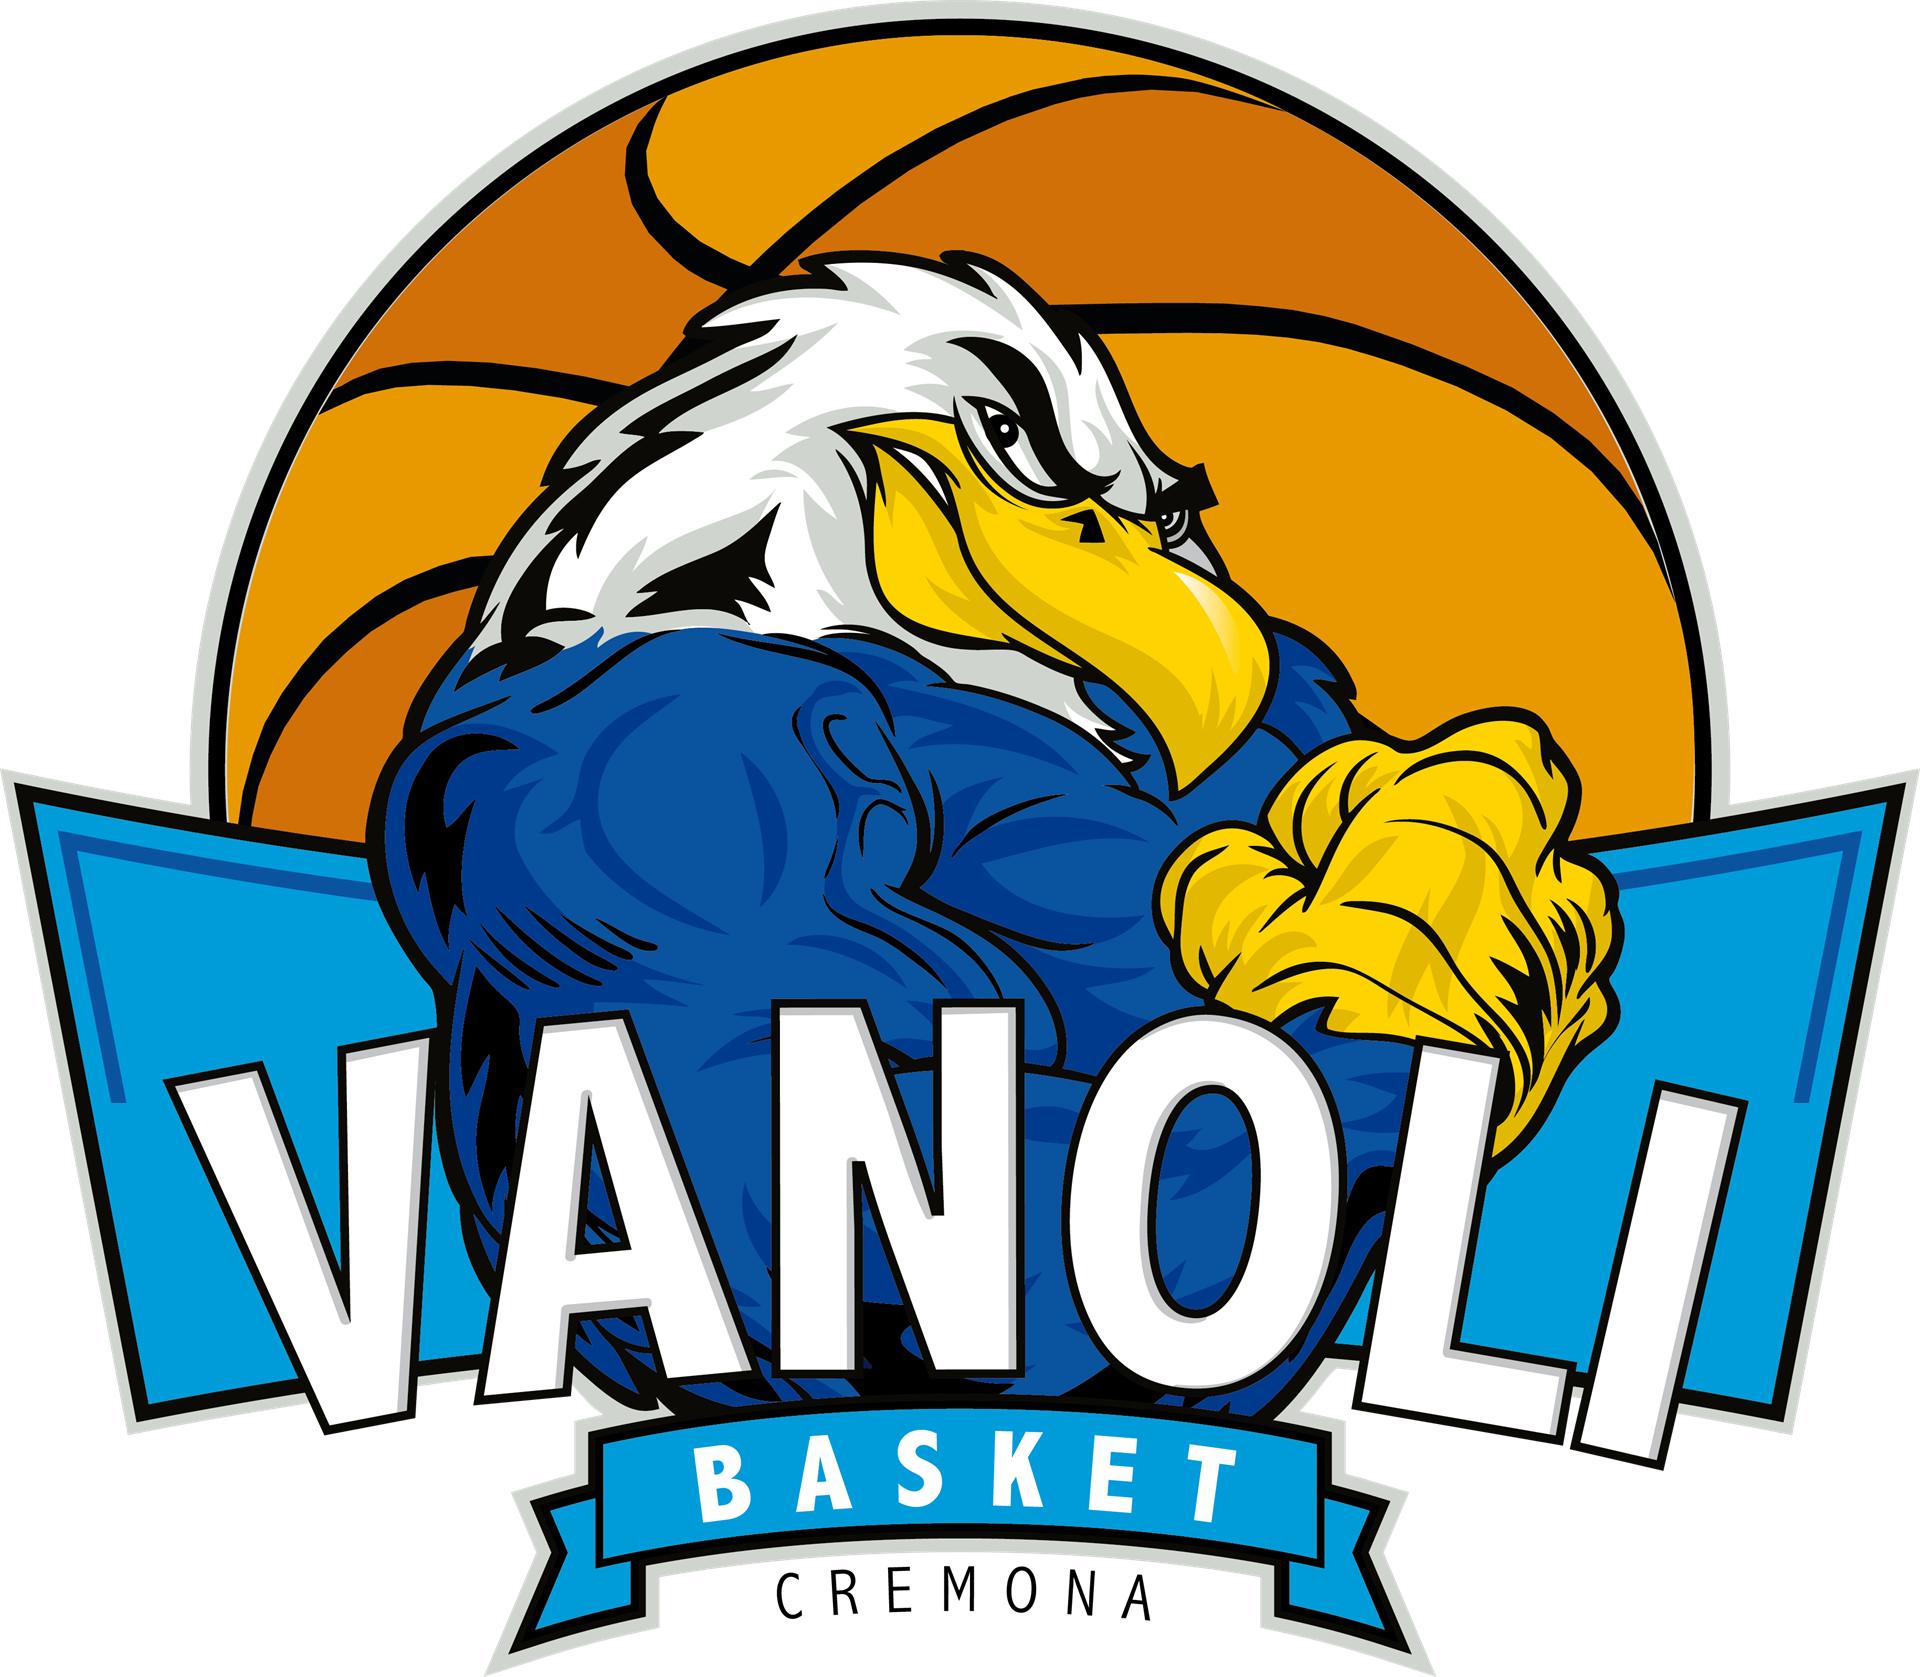 Logo Vanoli Basket 2020